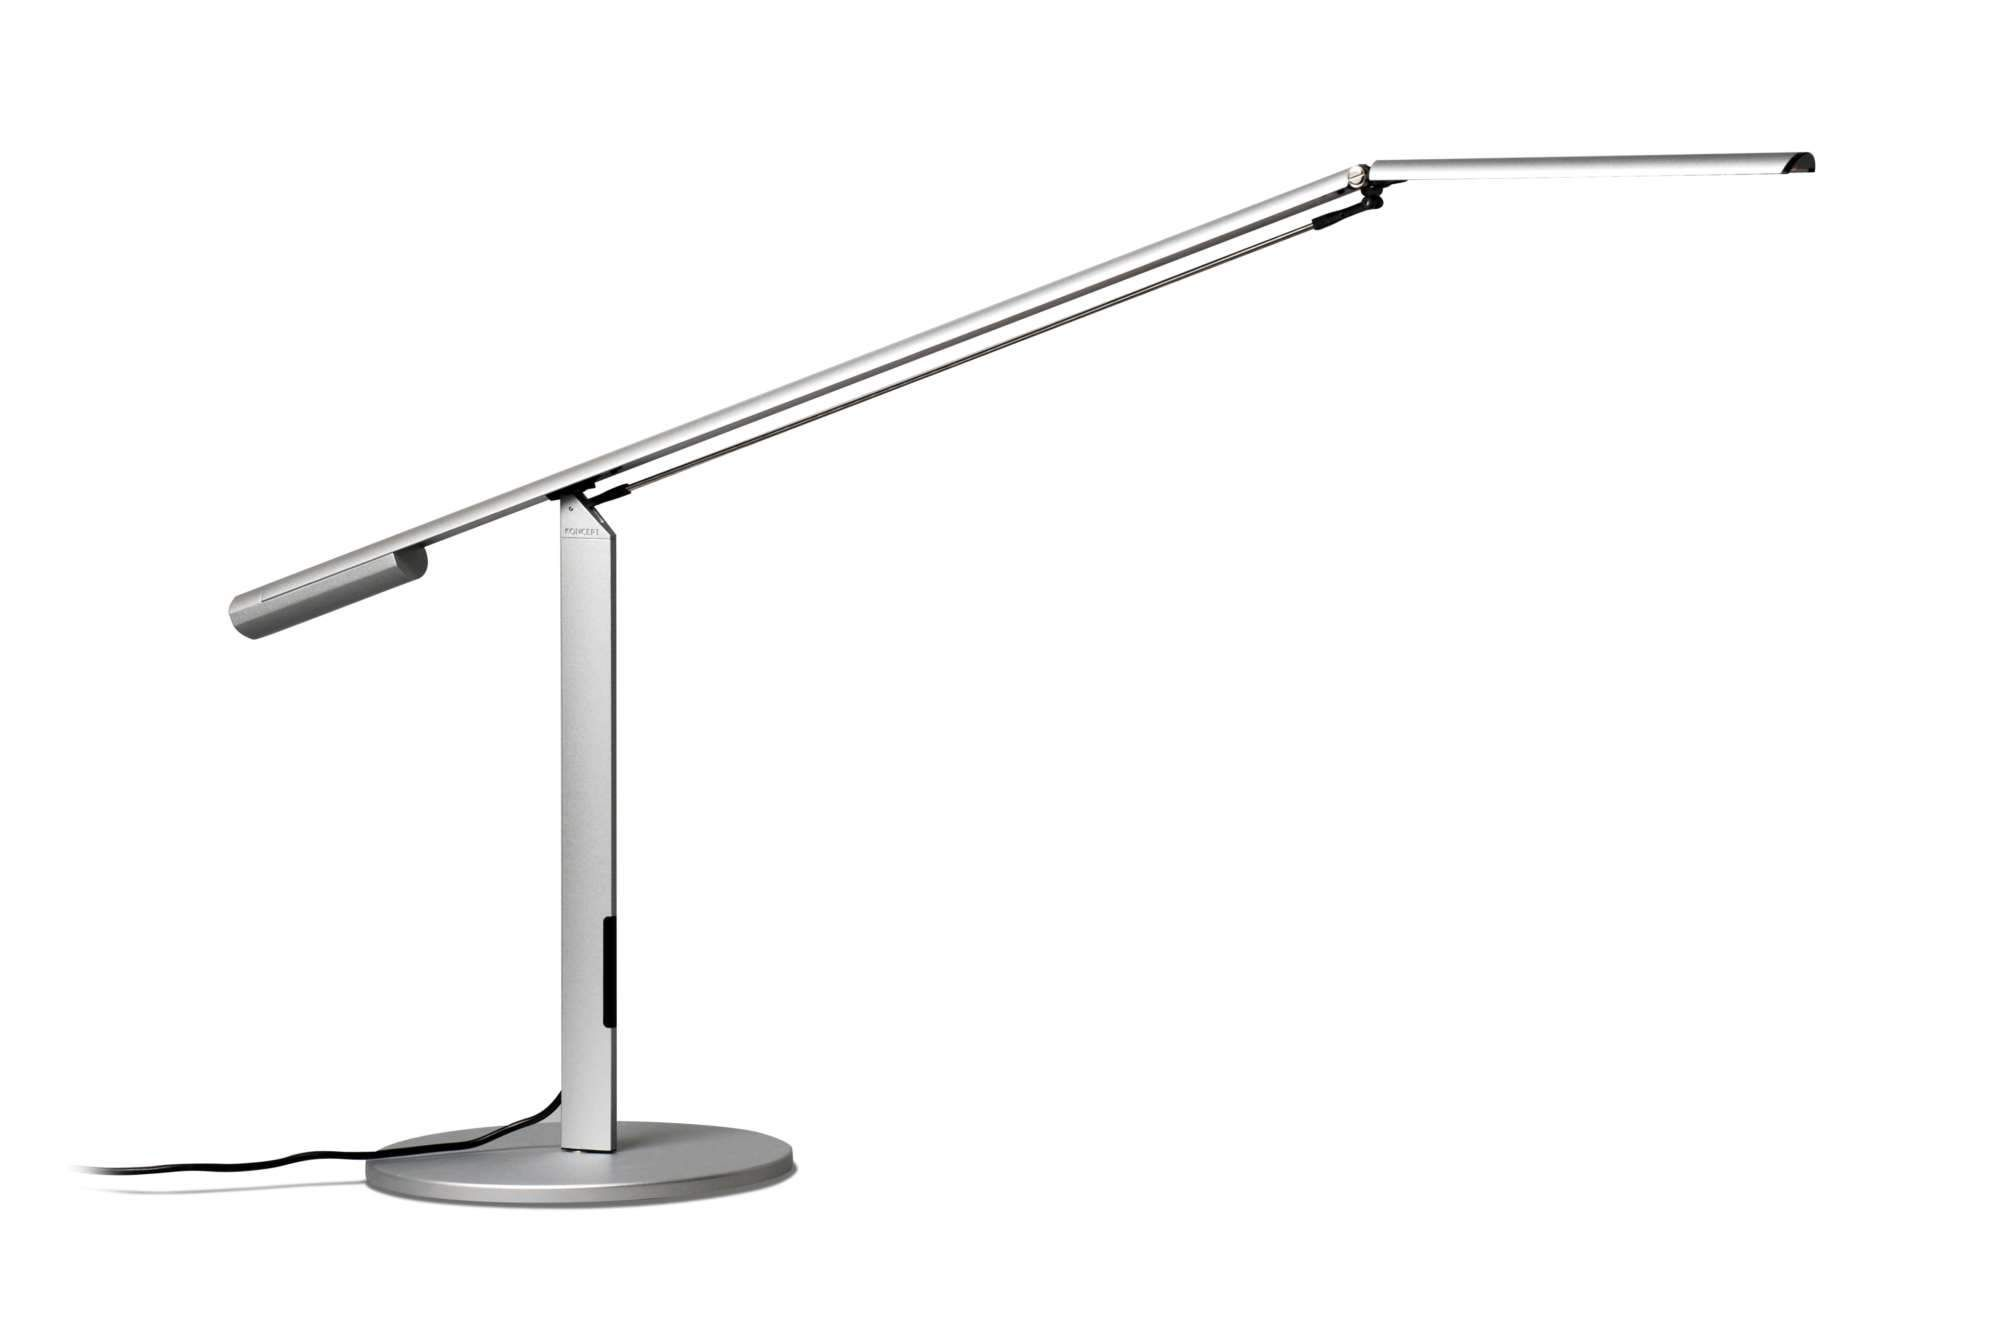 Equo Led Desk Lamp Desk Lamp Lamp Led Desk Lamp